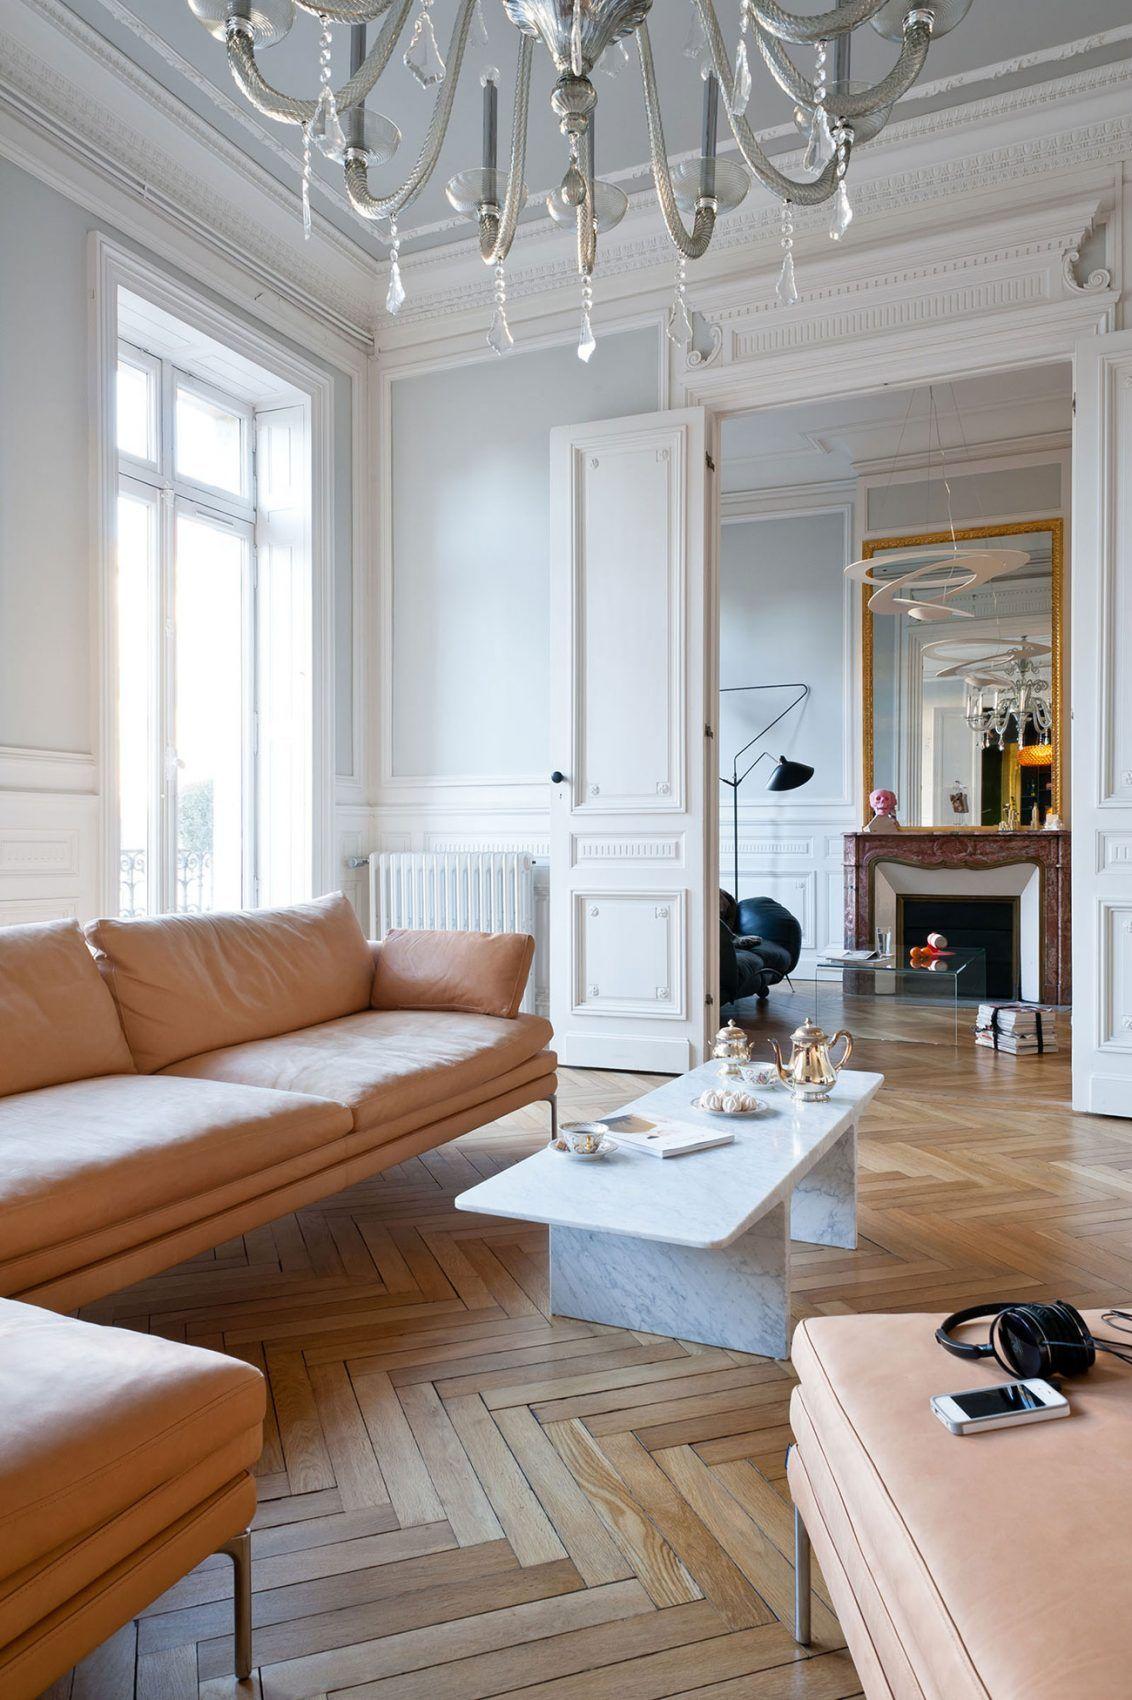 architecte interieur daphn serrado transforms a former. Black Bedroom Furniture Sets. Home Design Ideas